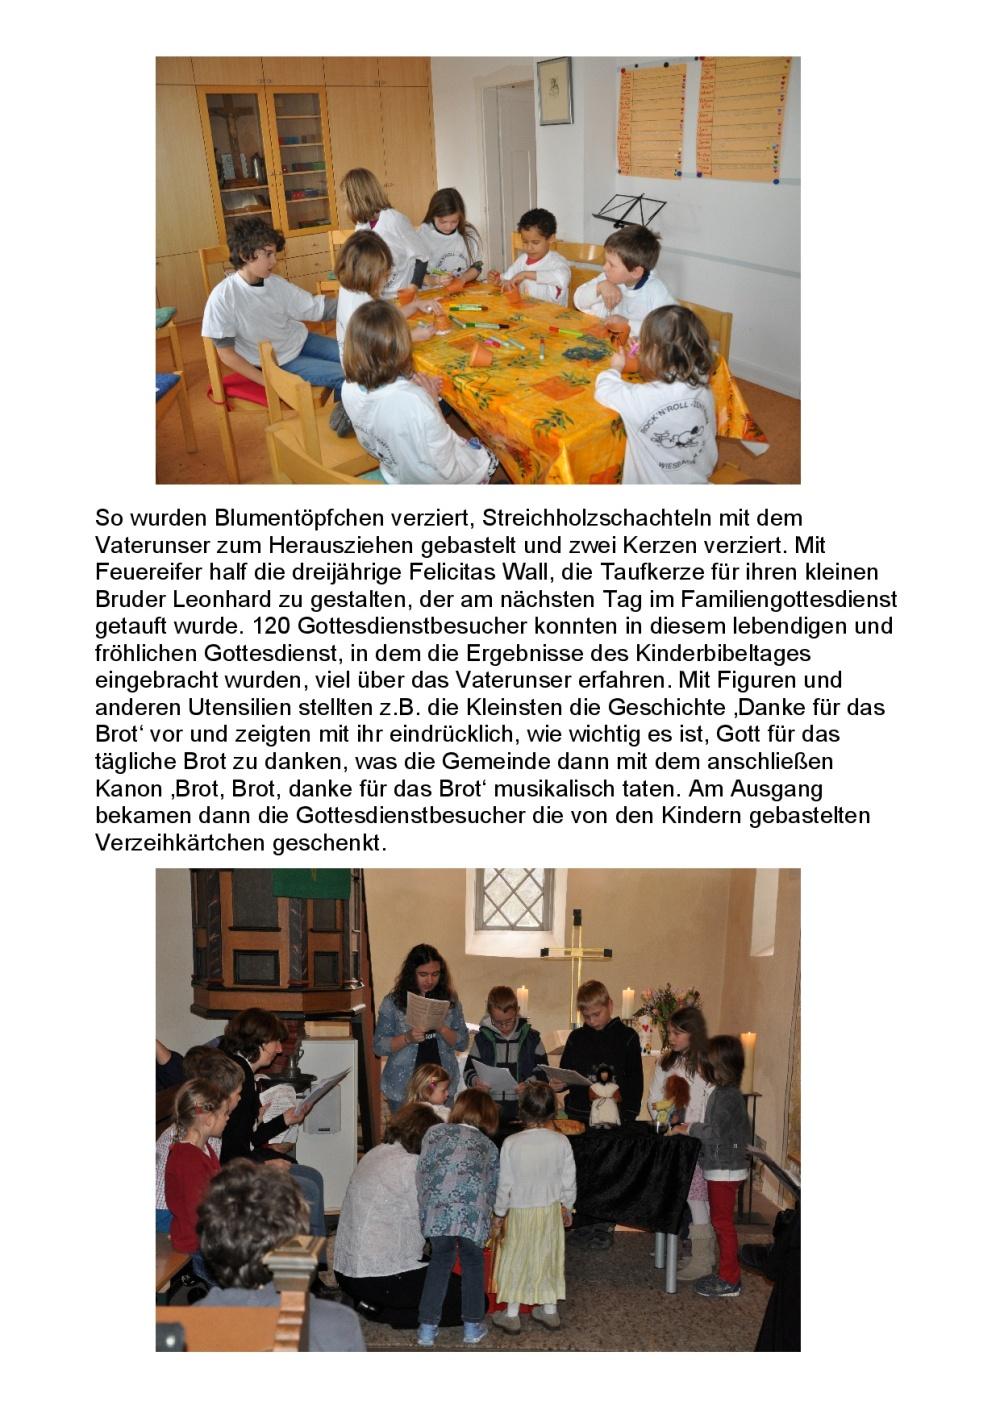 09-Kinderbibeltag 09.03.13-002